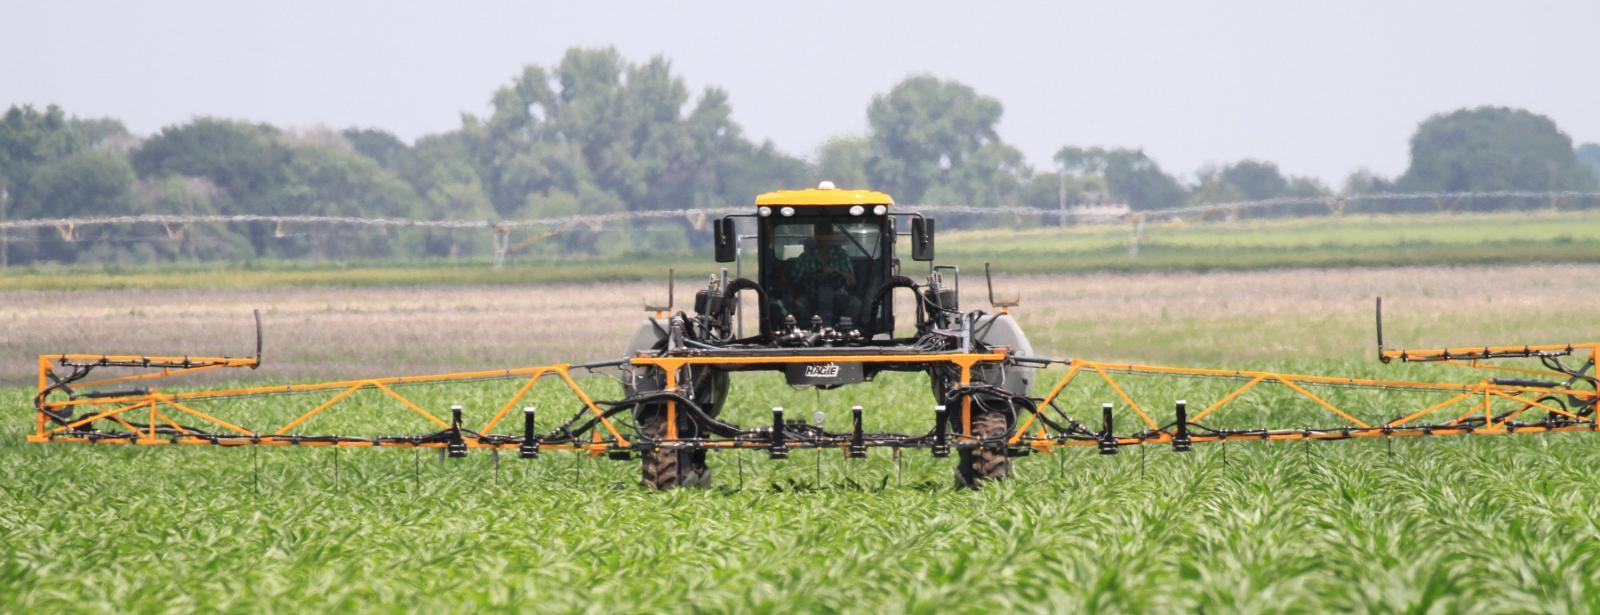 2021 Nebraska 4Rs Nutrient Stewardship Field Day